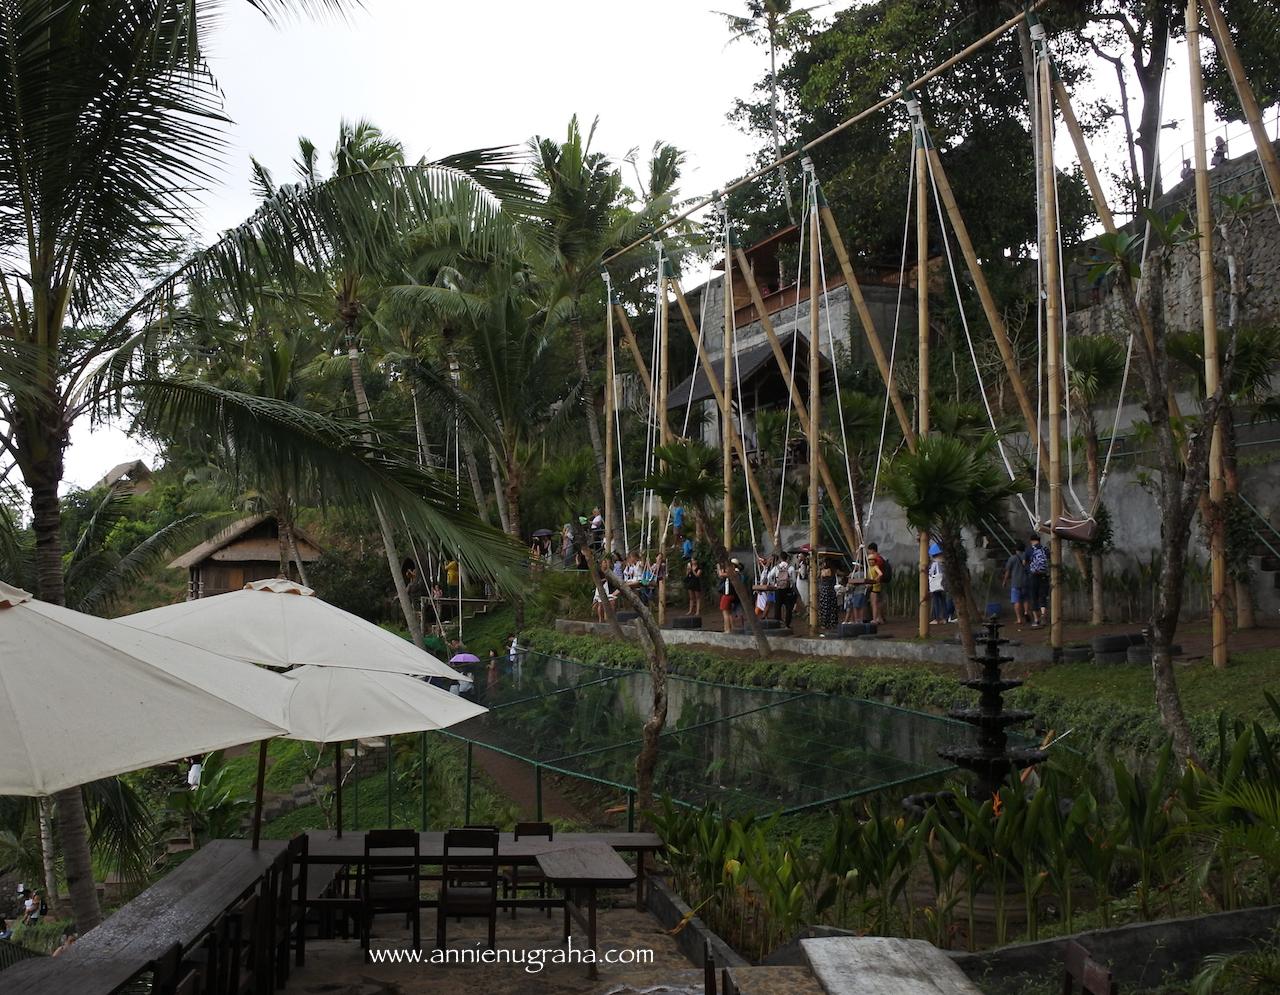 Bali Swing Wahana Berayun Di Pinggir Tebing Wisata